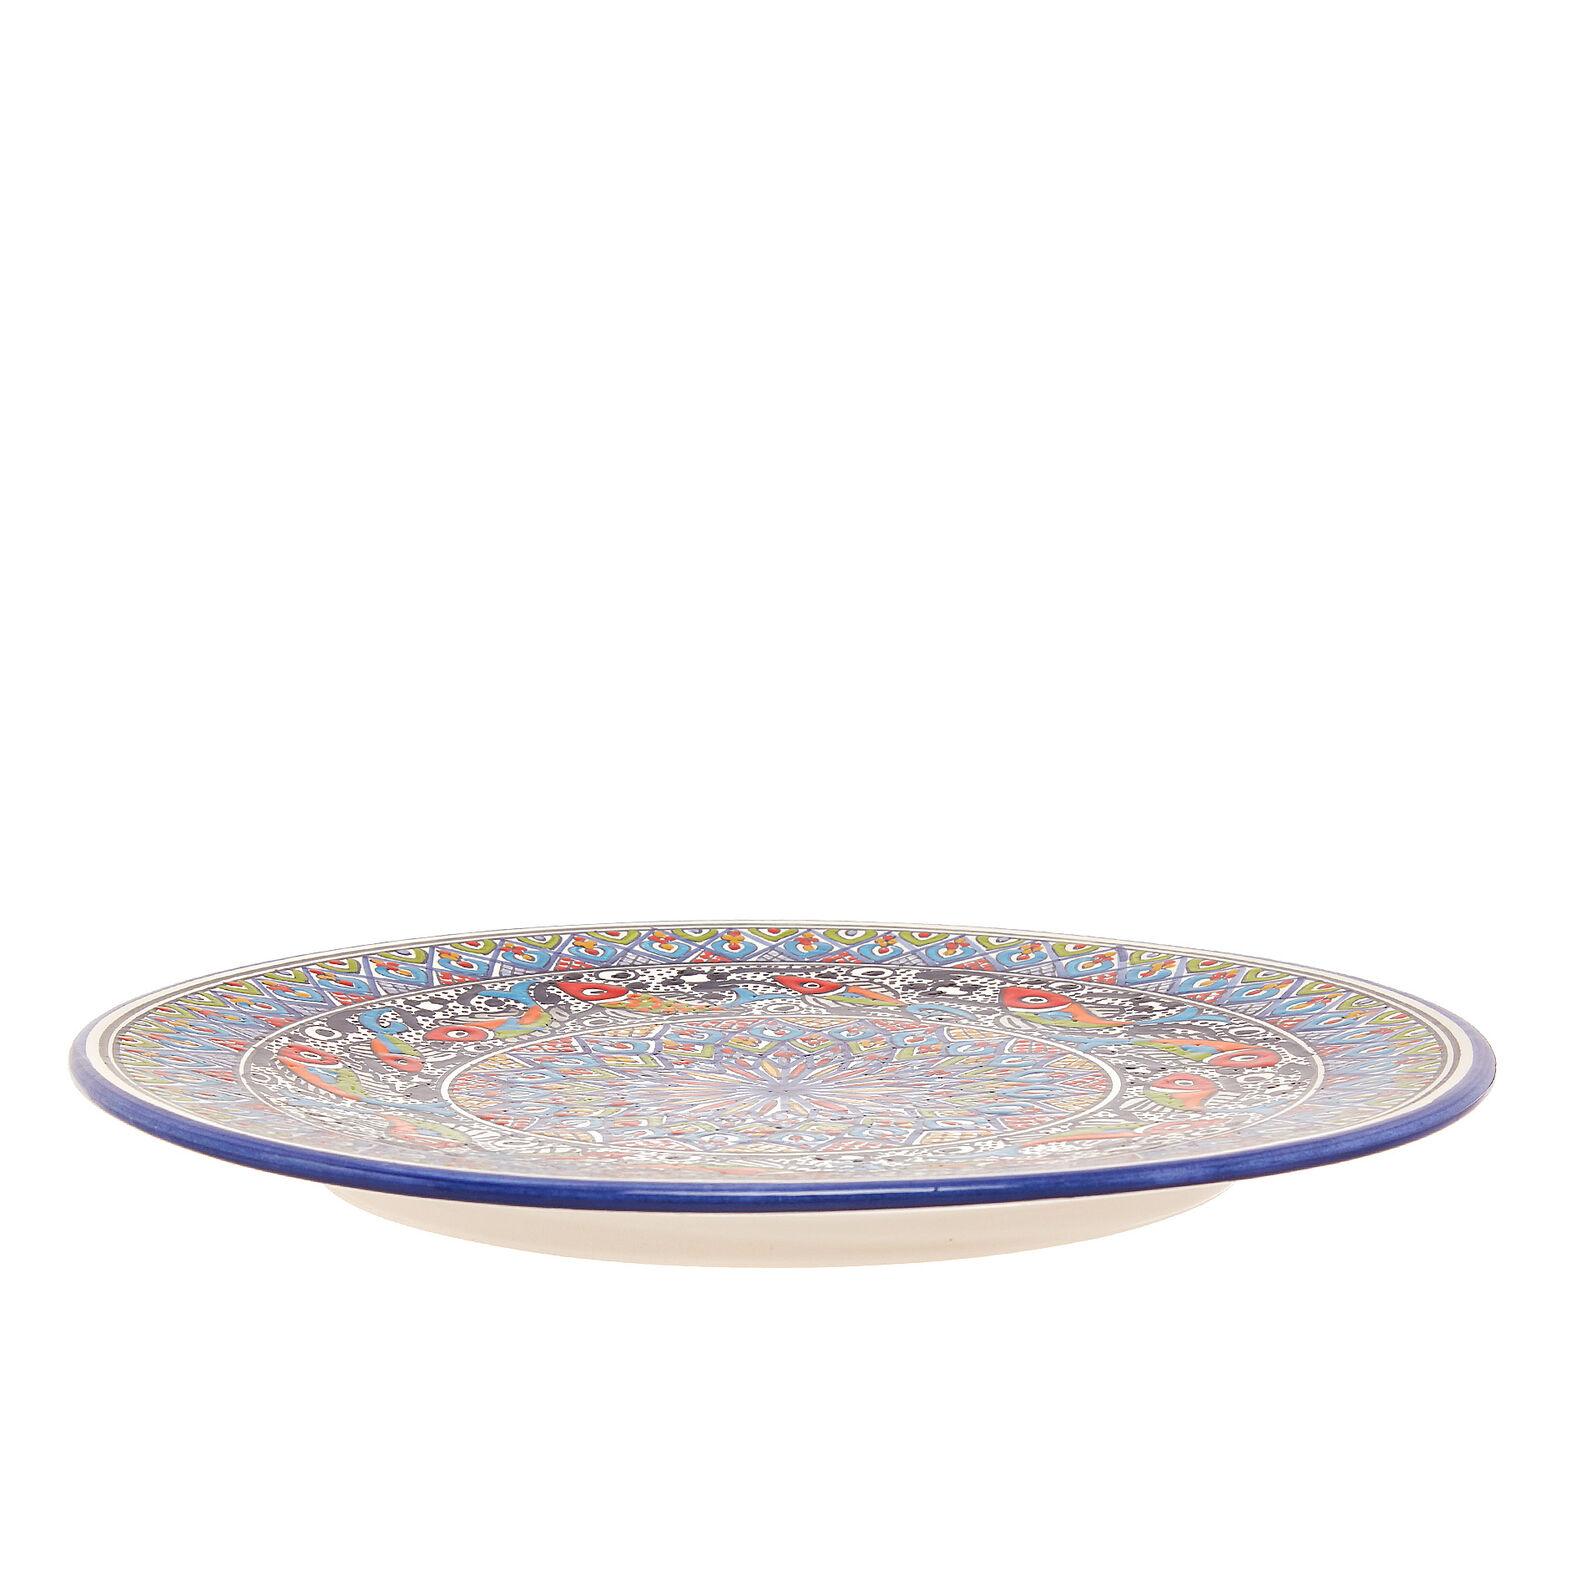 UNIDO handmade rectangular serving dish